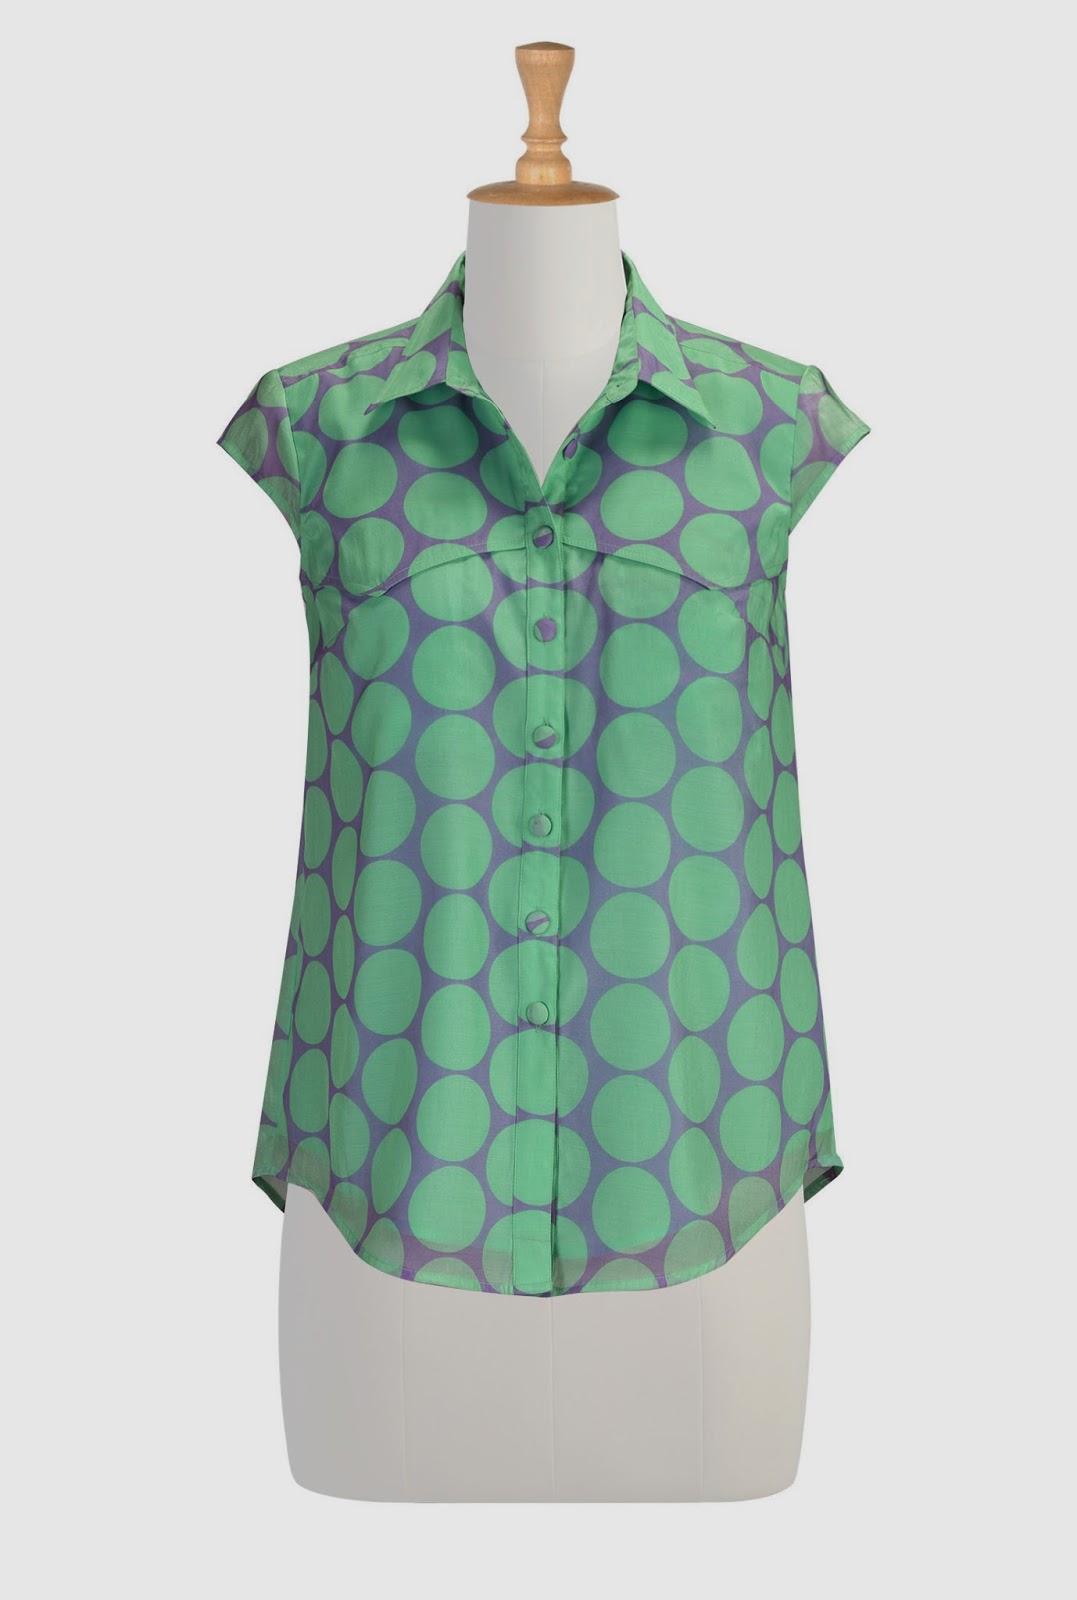 http://www.eshakti.com/Product/CL0030560/Polka-dot-organza-western-shirt